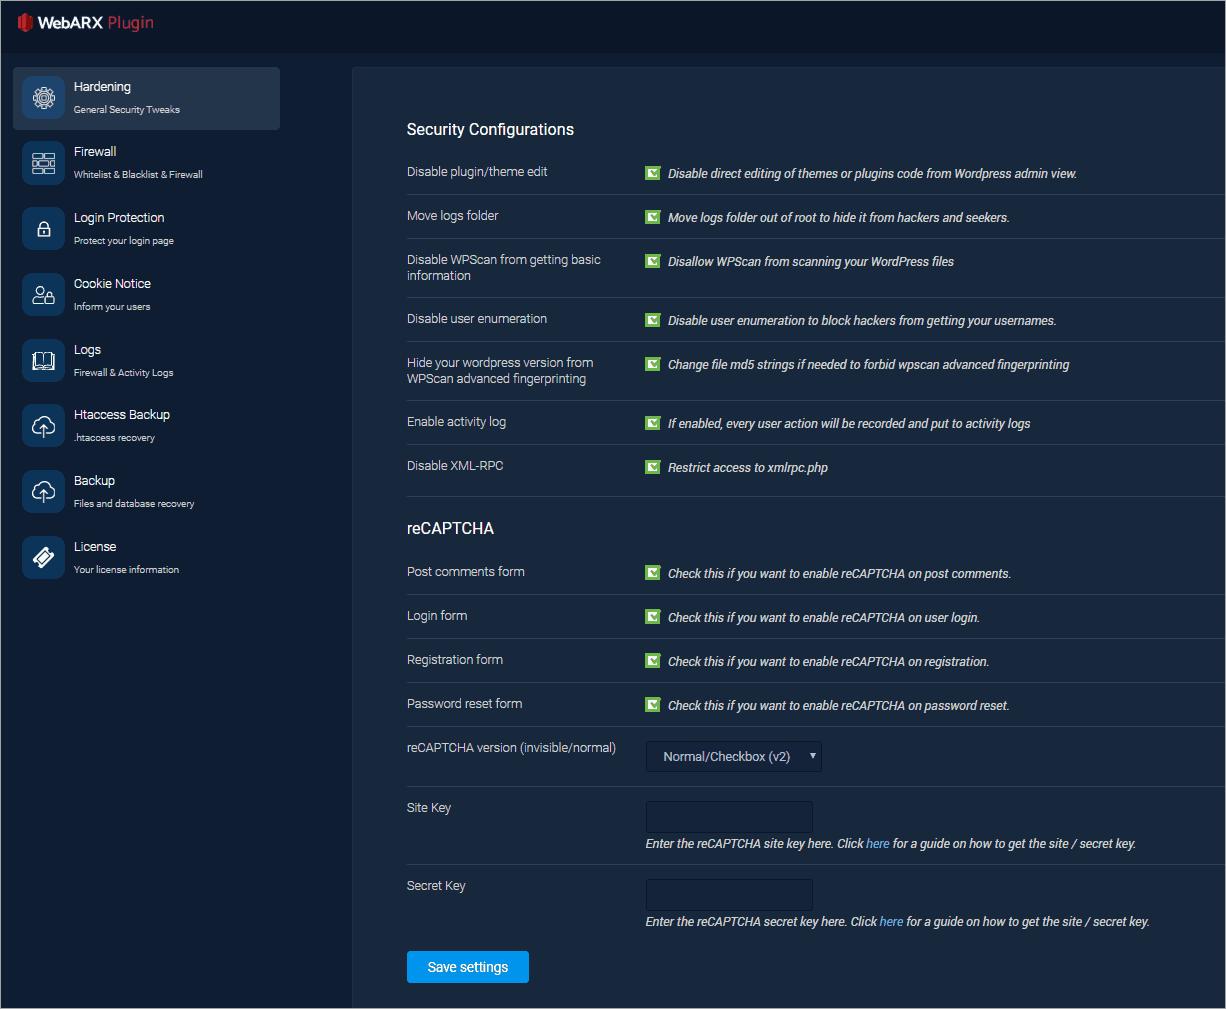 webarx plugin hardening